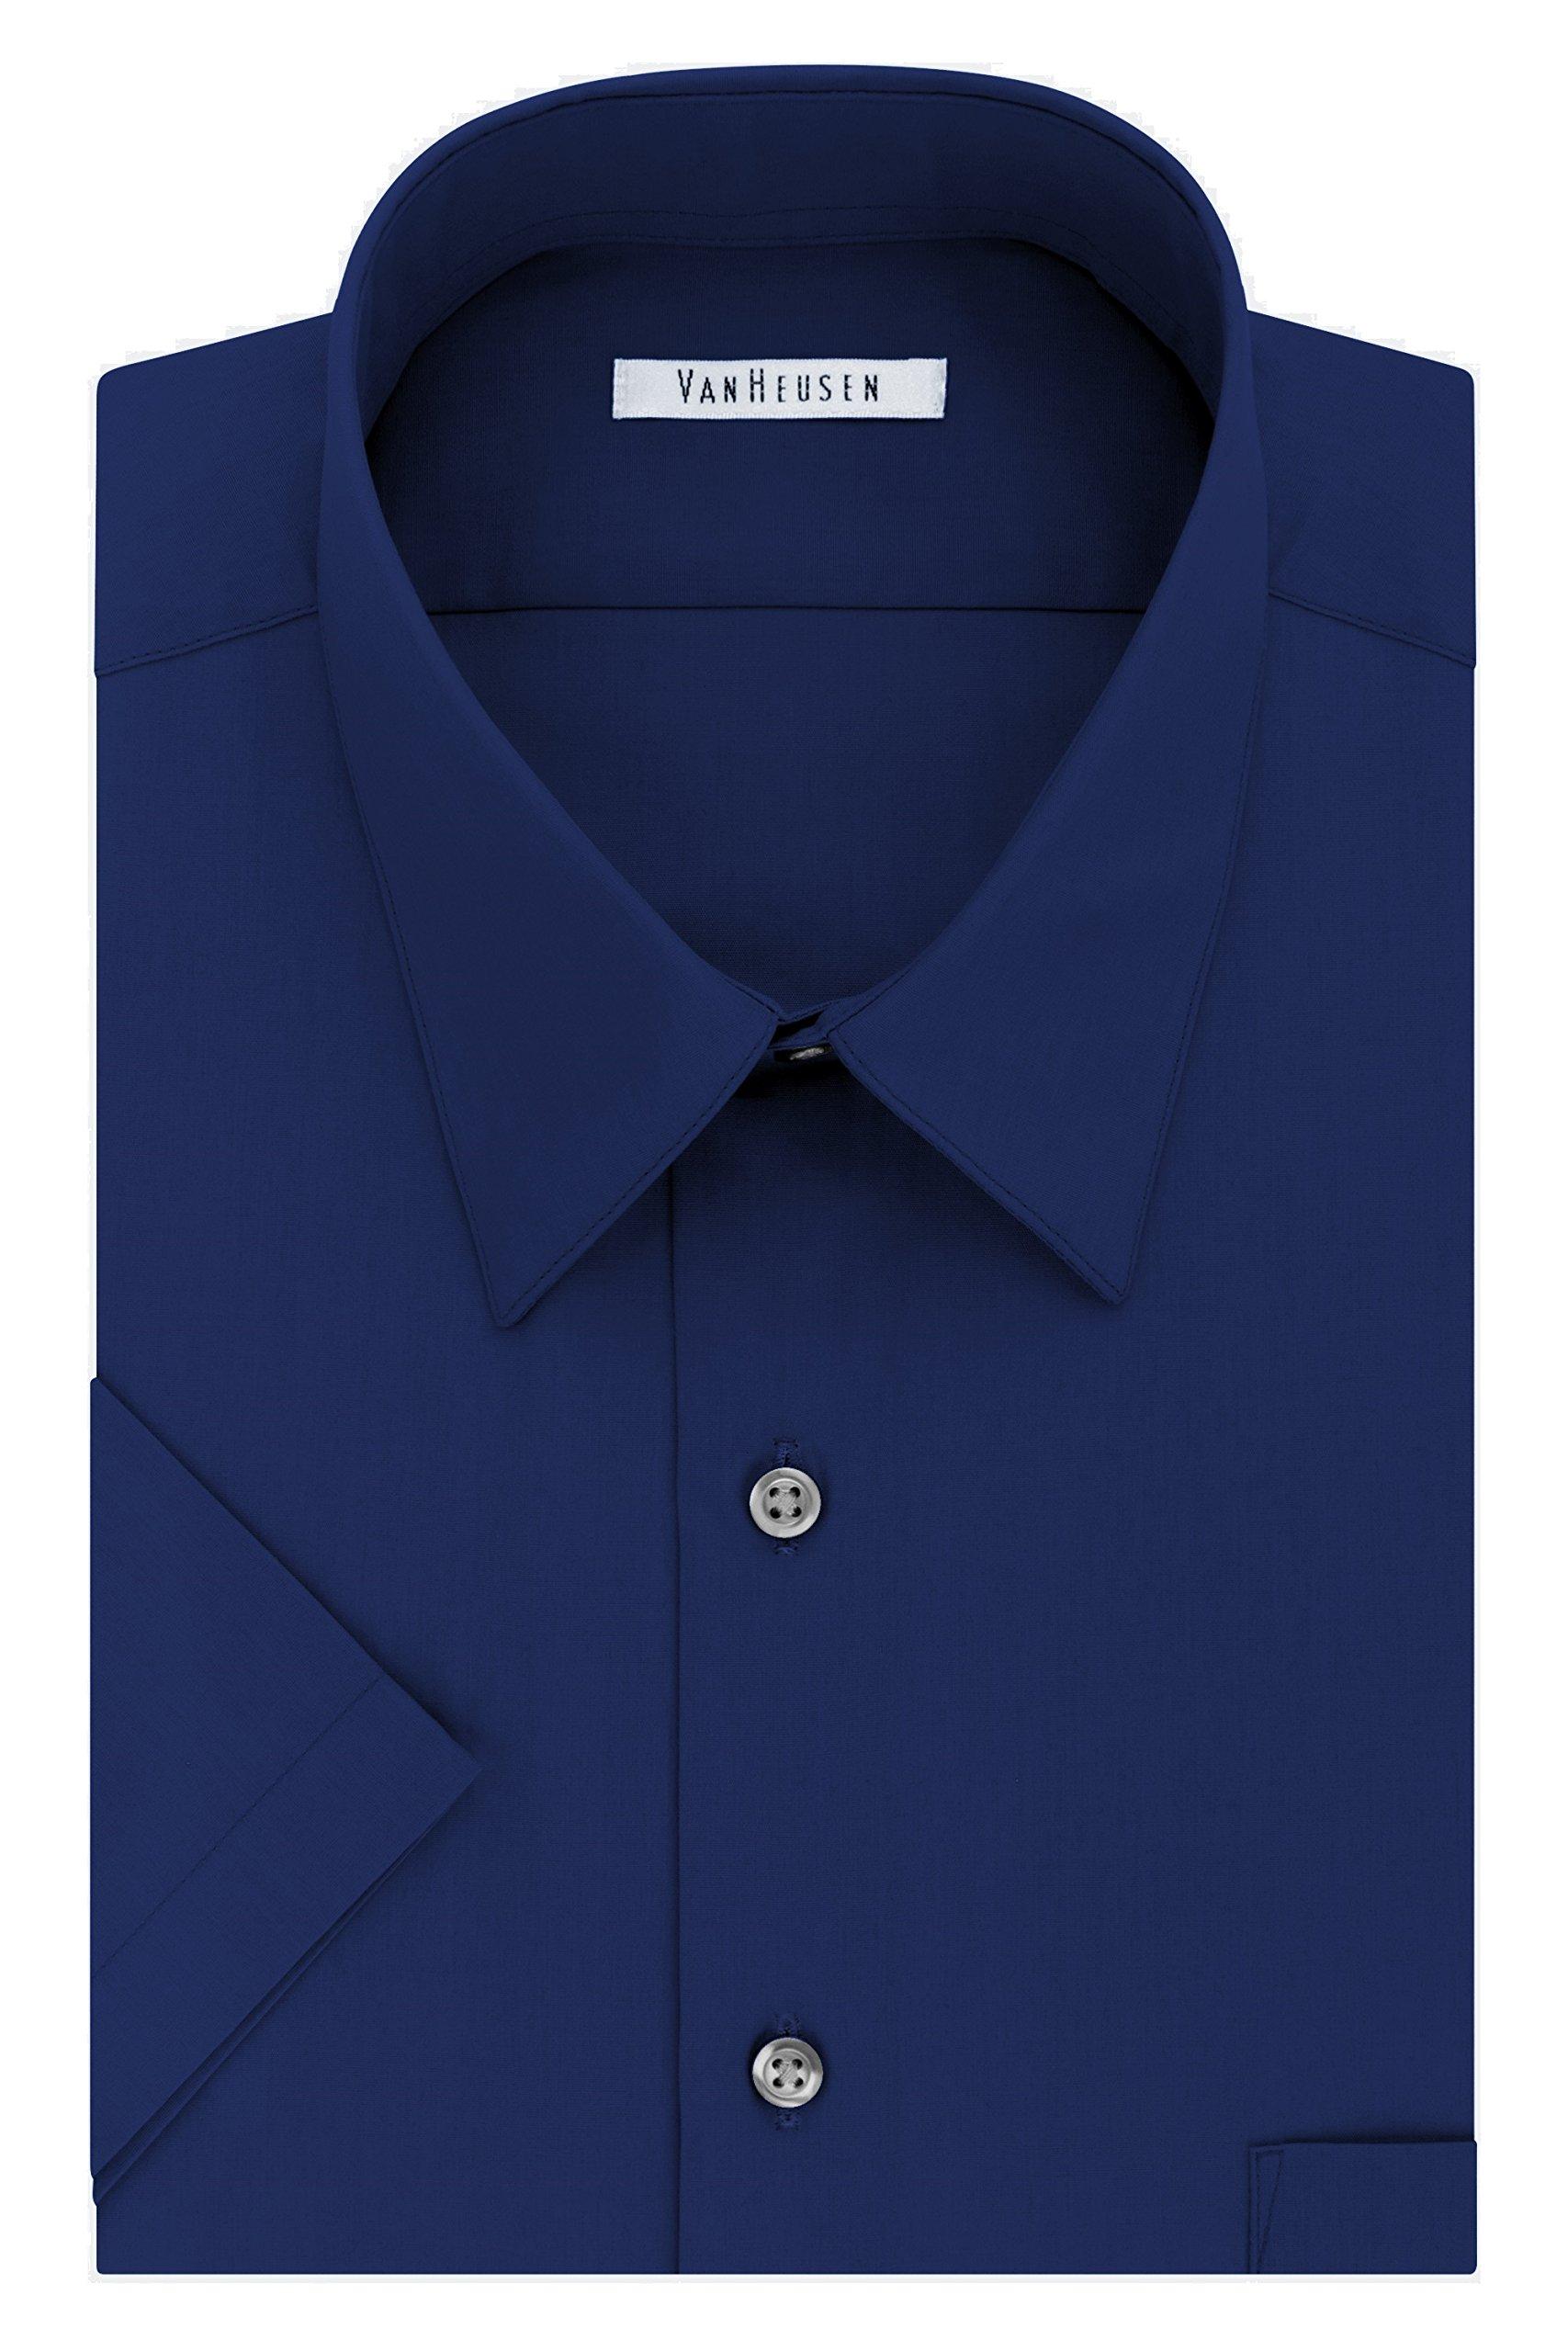 Van Heusen Men's Short Sleeve Poplin Solid Dress Shirt, Persian Blue, 16.5'' Neck